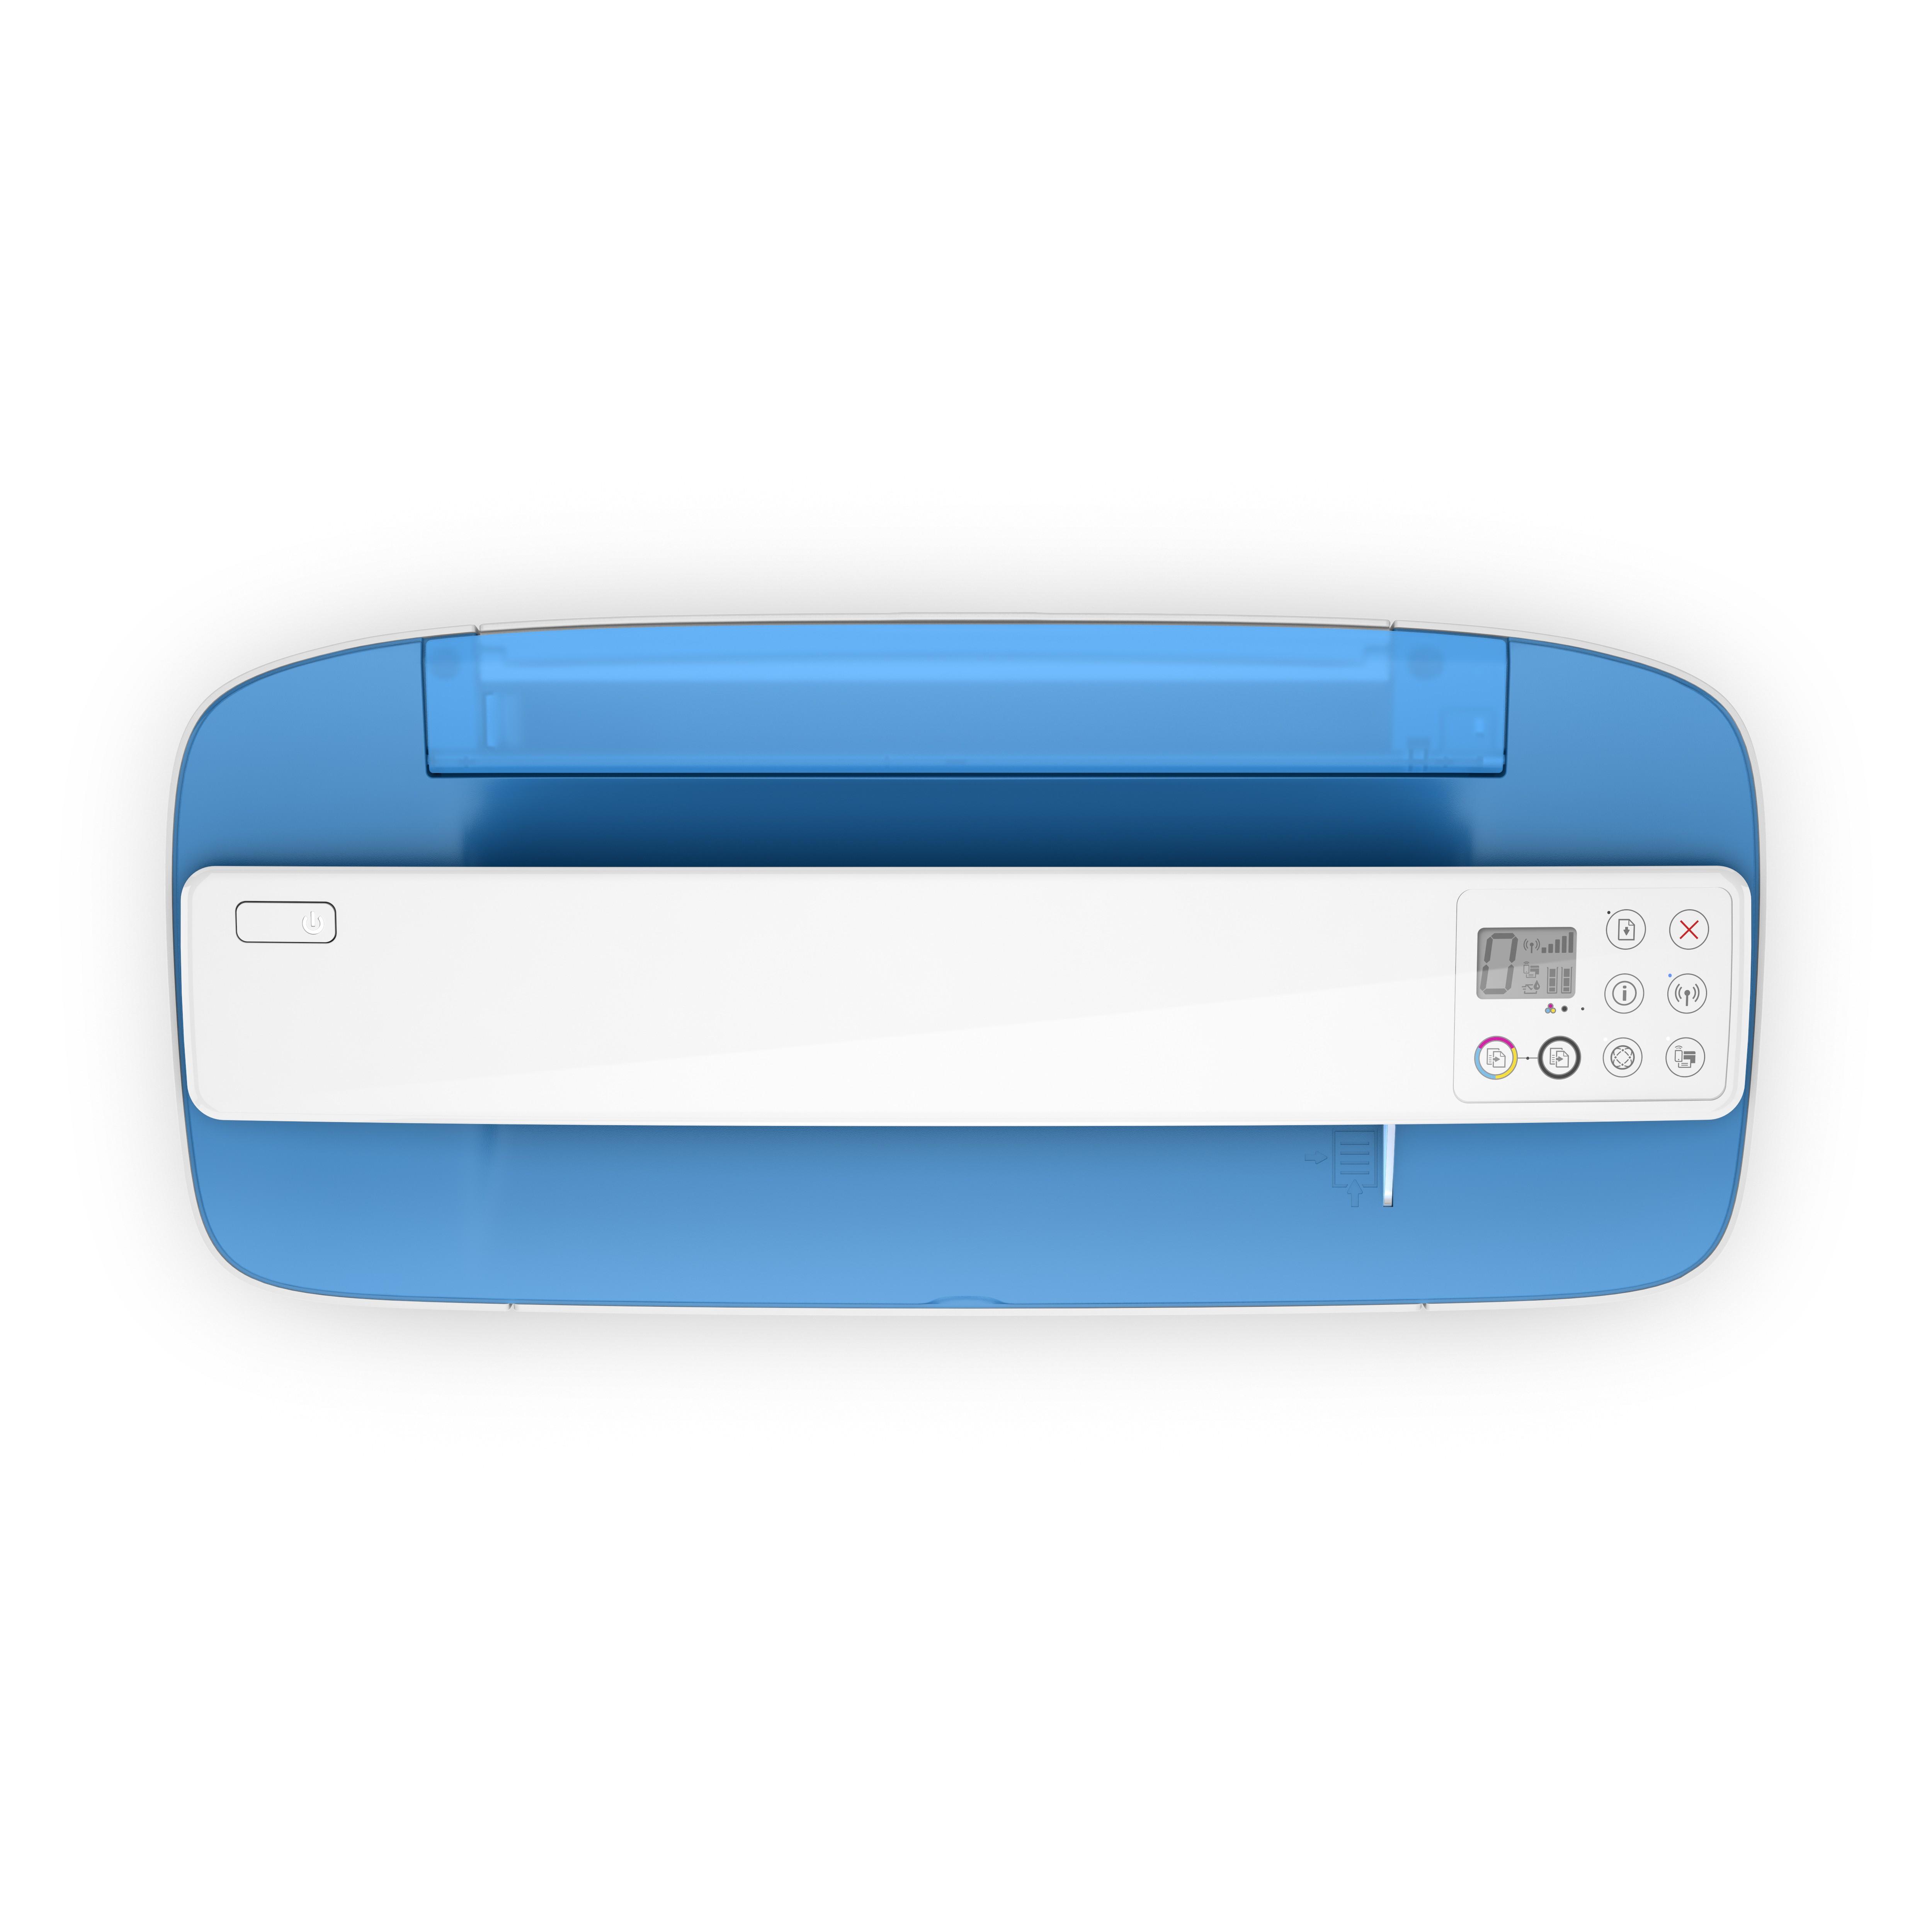 Impresora Multifuncional Hp Deskjet Ink 3775 Azul Alkosto